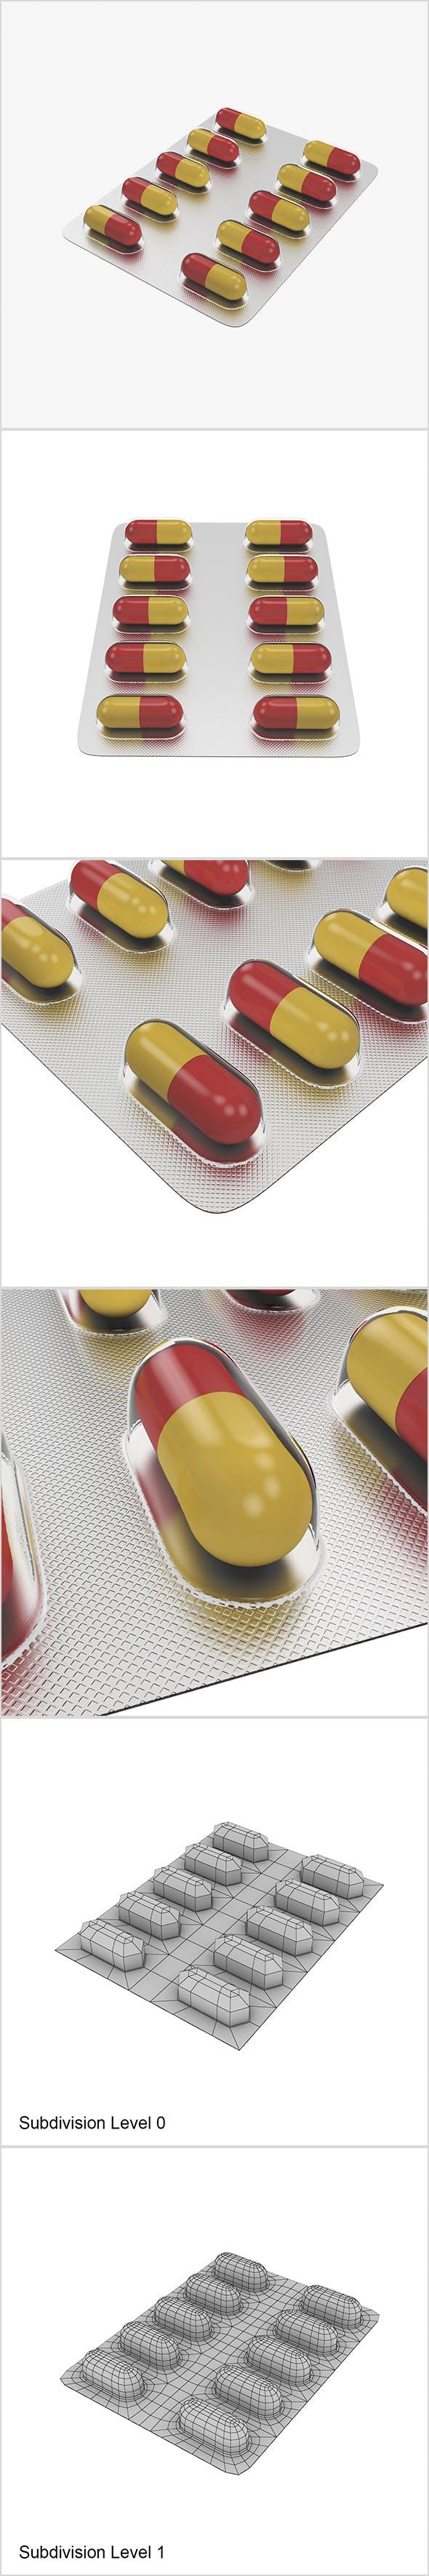 Pills in blister pack - 3DOcean Item for Sale